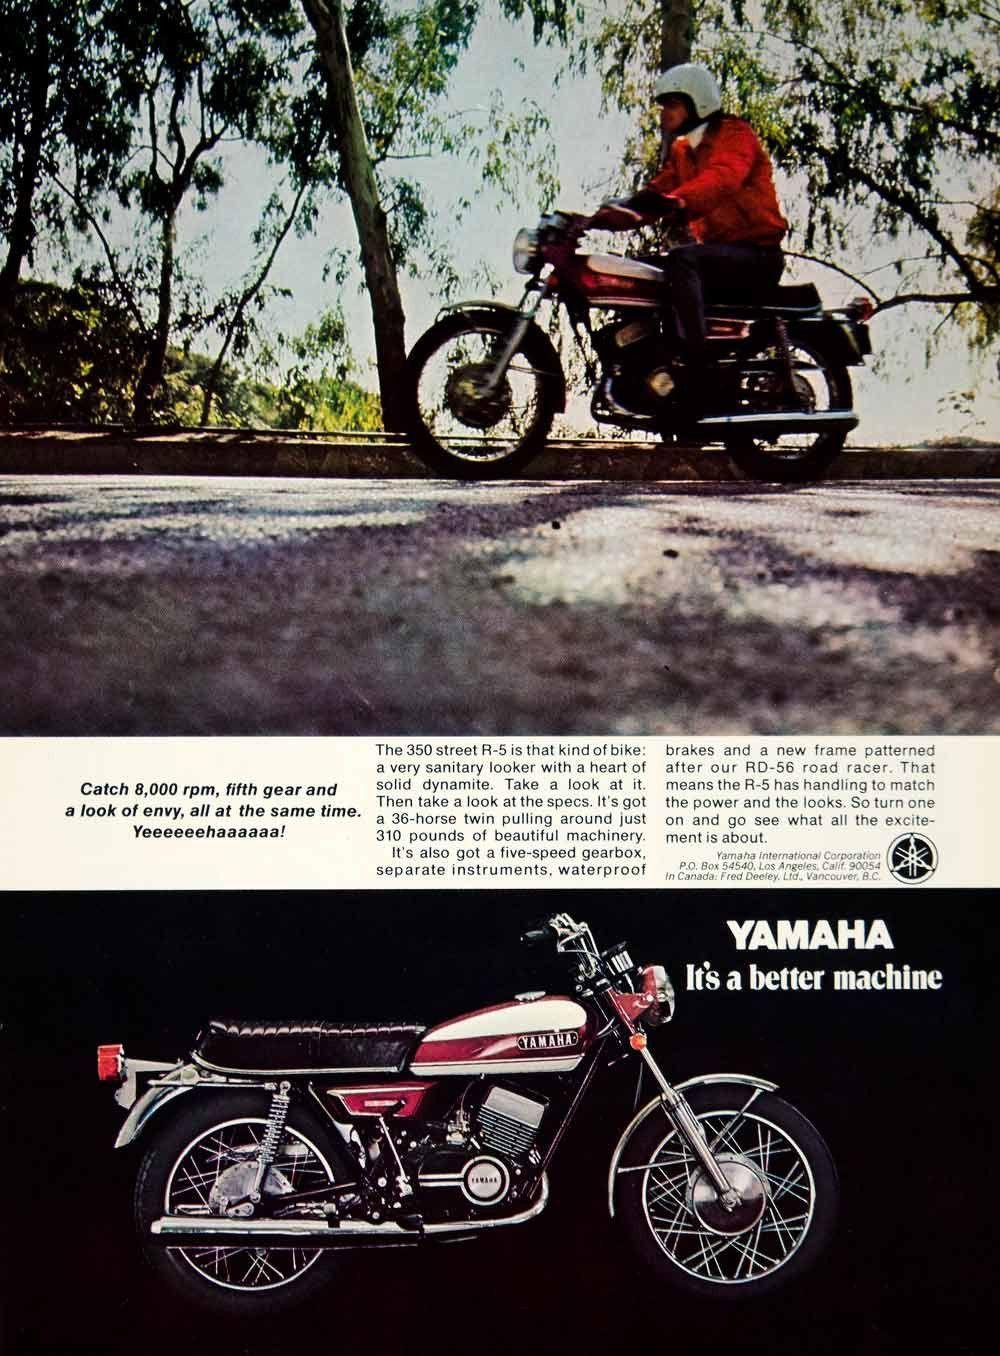 1970 Ad Yamaha R5 RD350 Classic Motorcycle Transportation